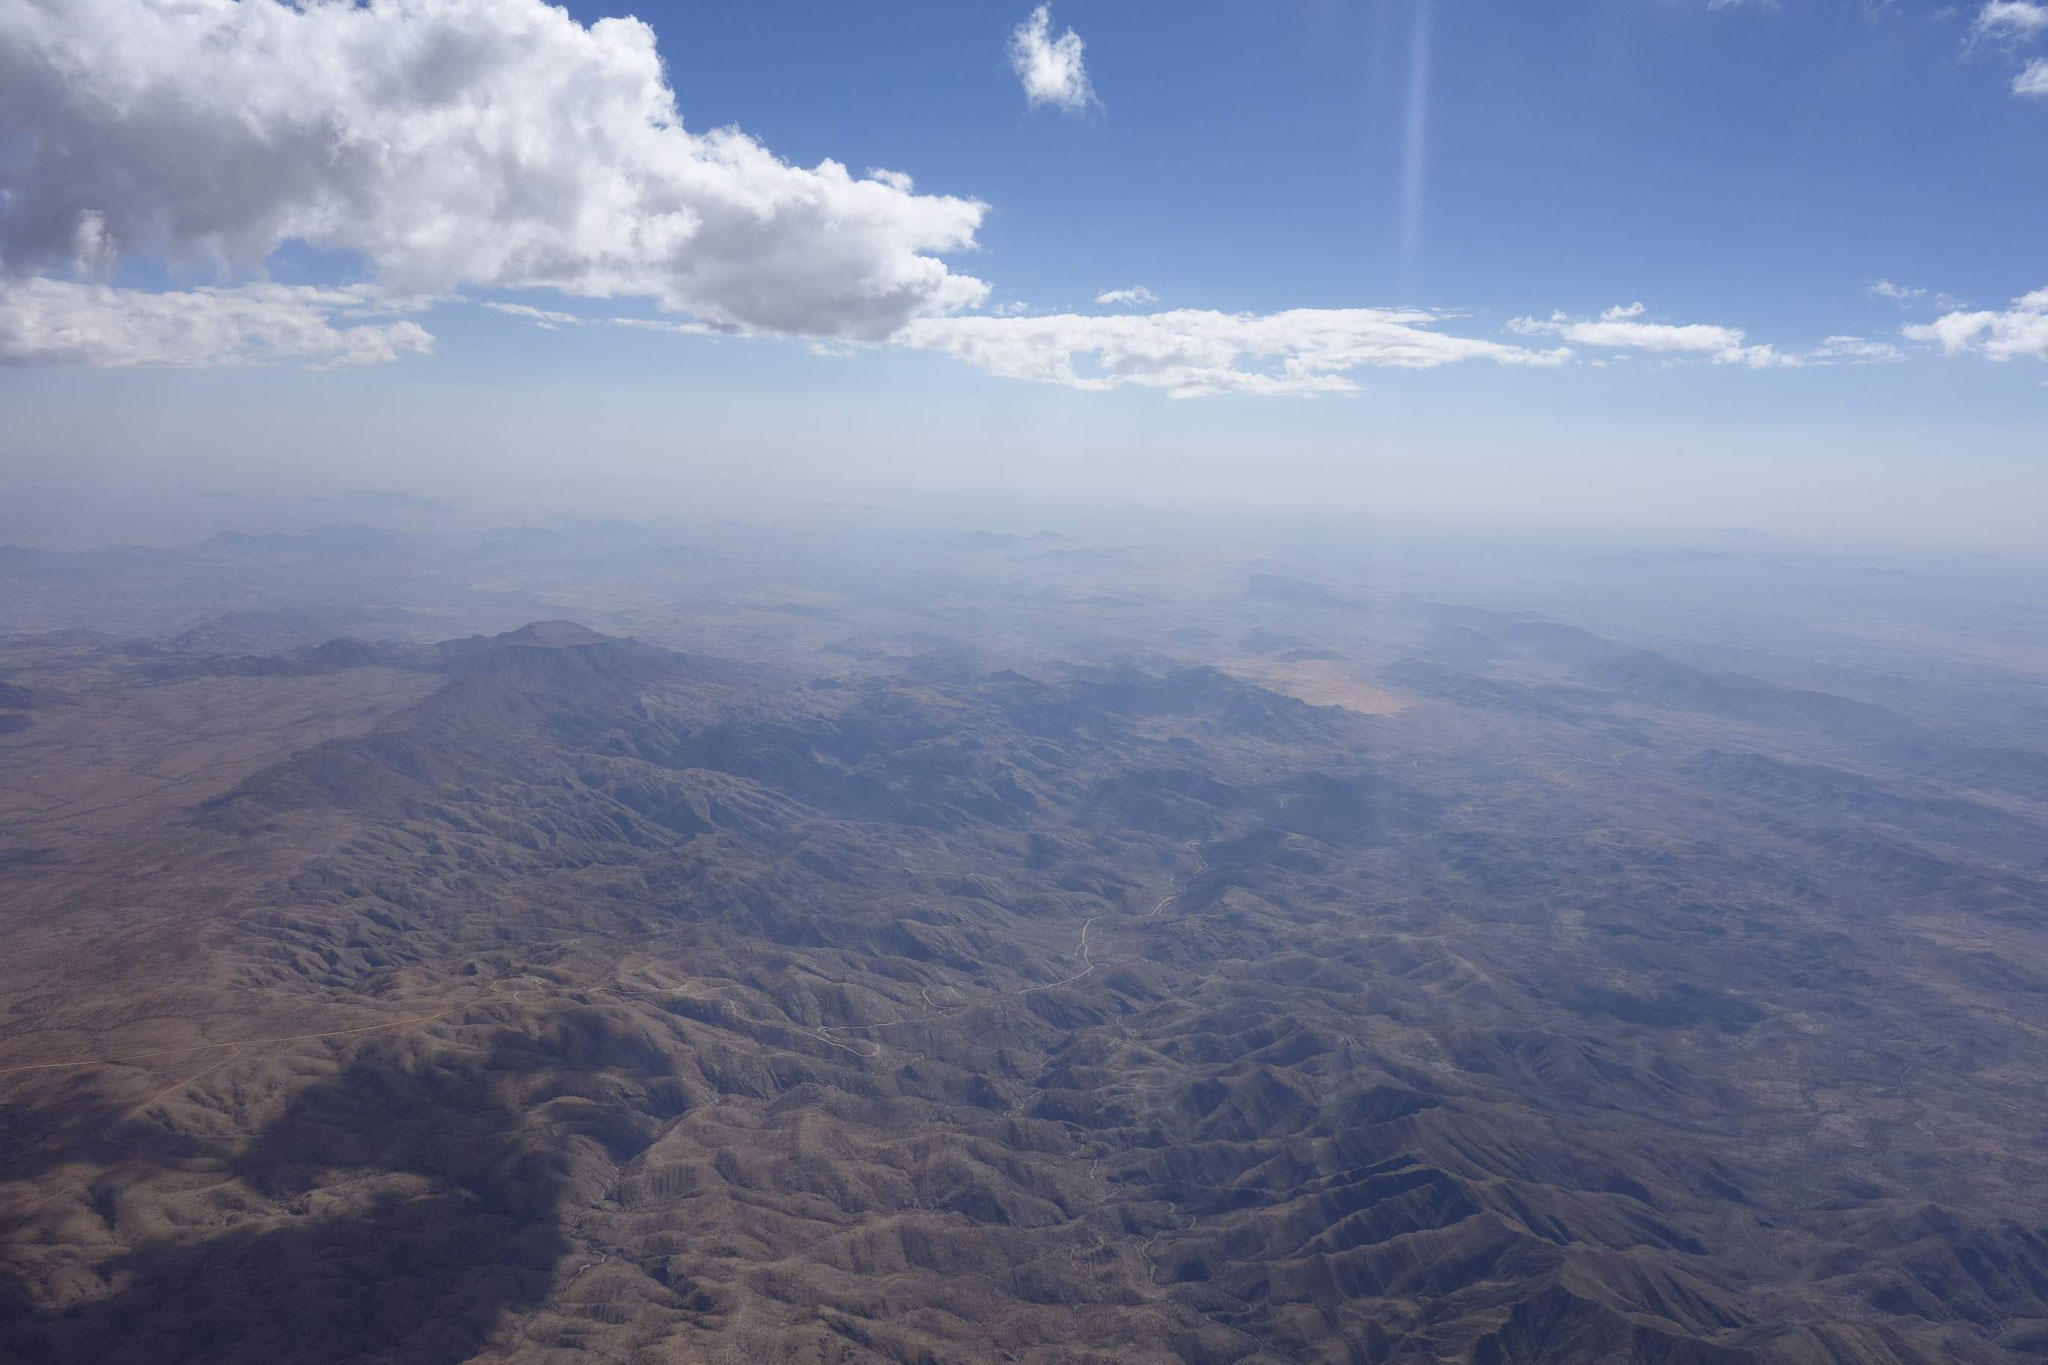 Gamsberg mit Blick auf die Namib